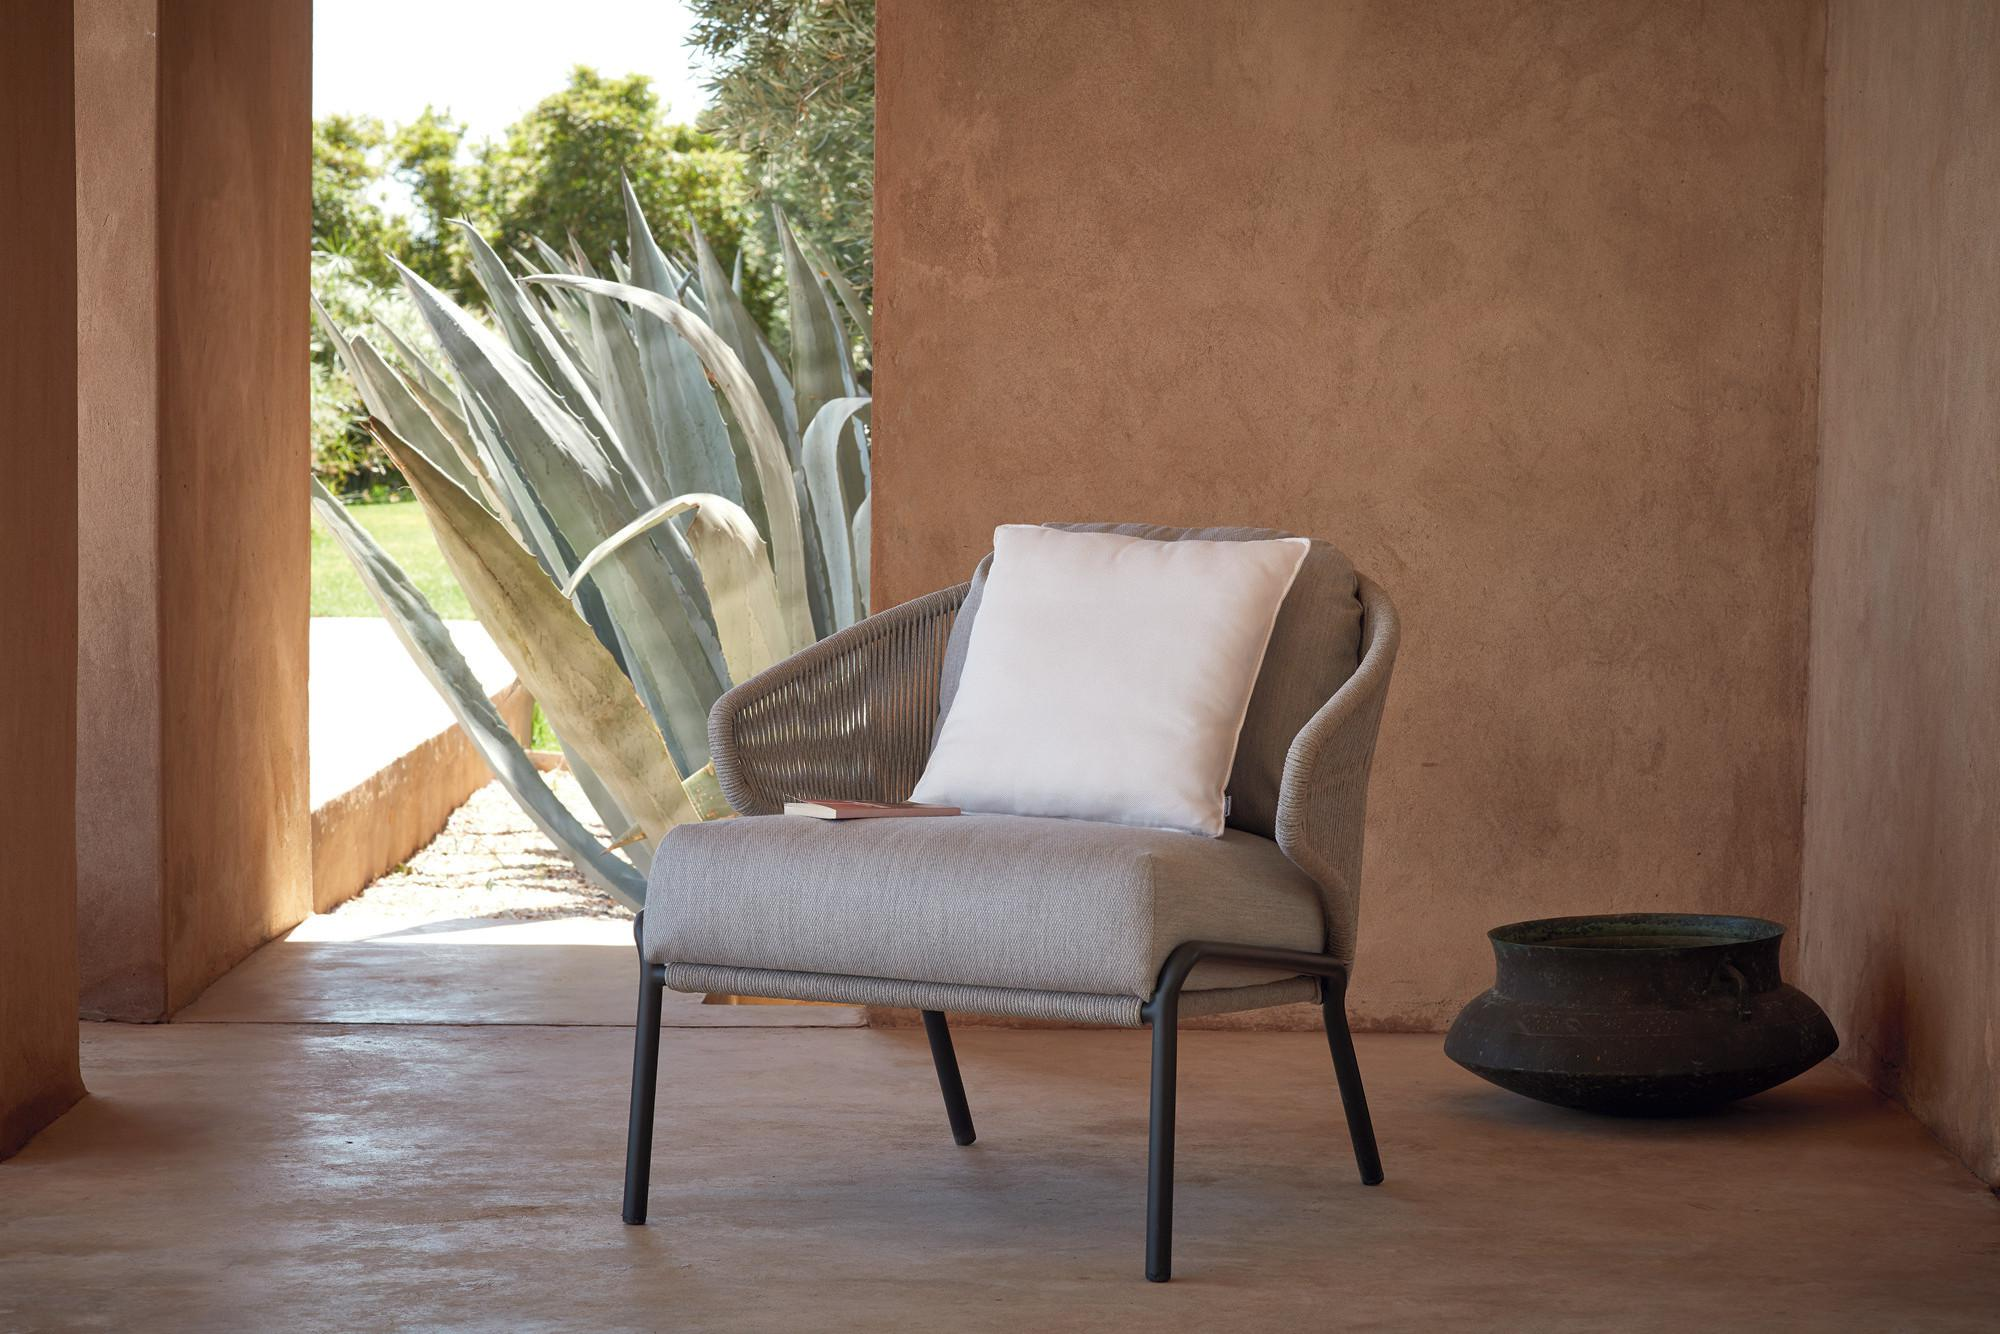 Radius lounge chair in small patio